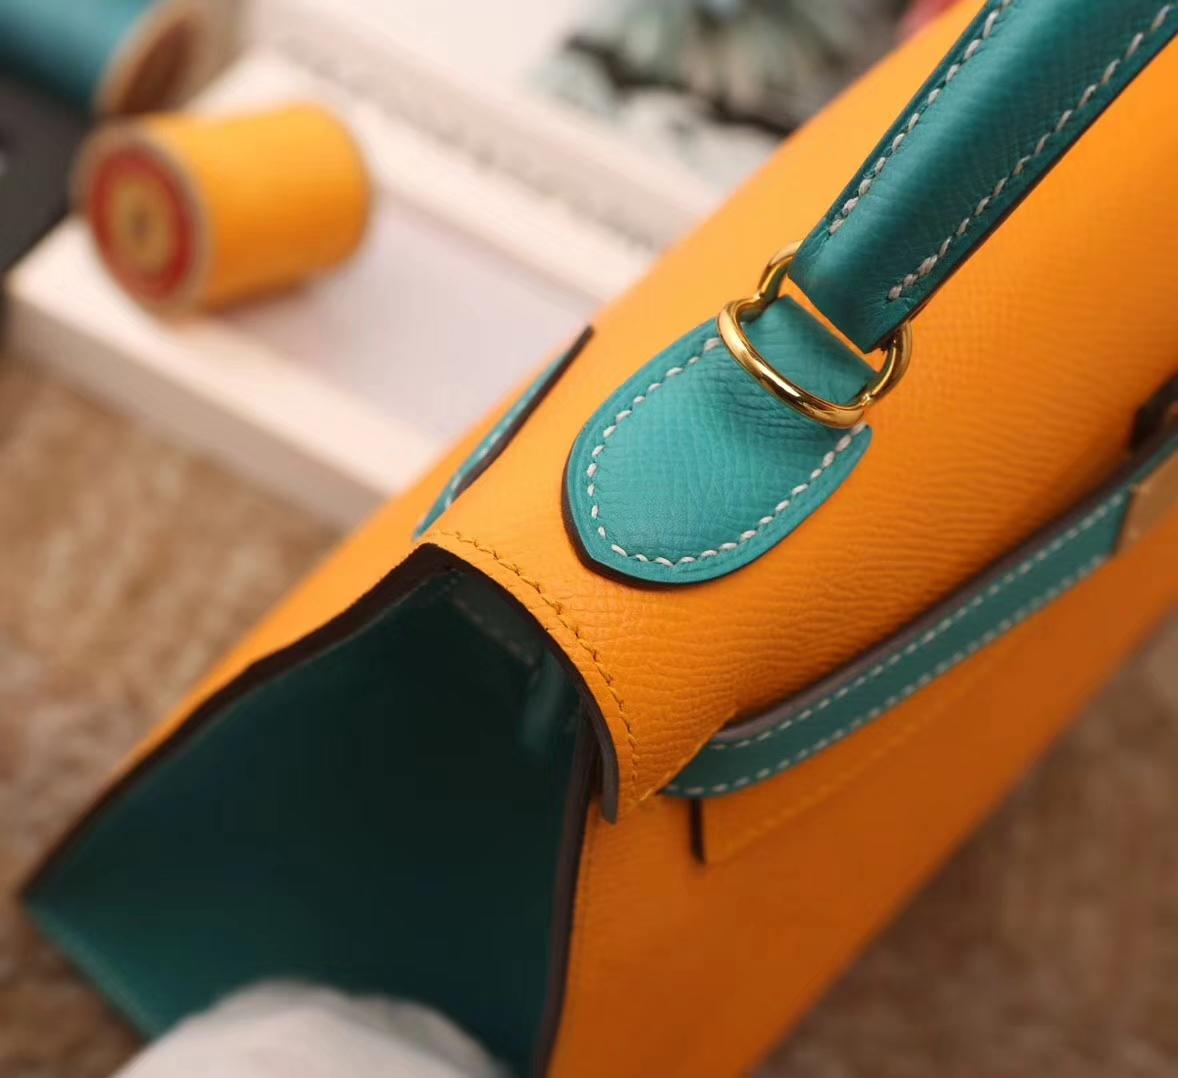 Hermes爱马仕 Kelly 28 9V 太阳黄拼7F孔雀蓝 原厂御用顶级Epsom皮 外缝 金扣 全手工